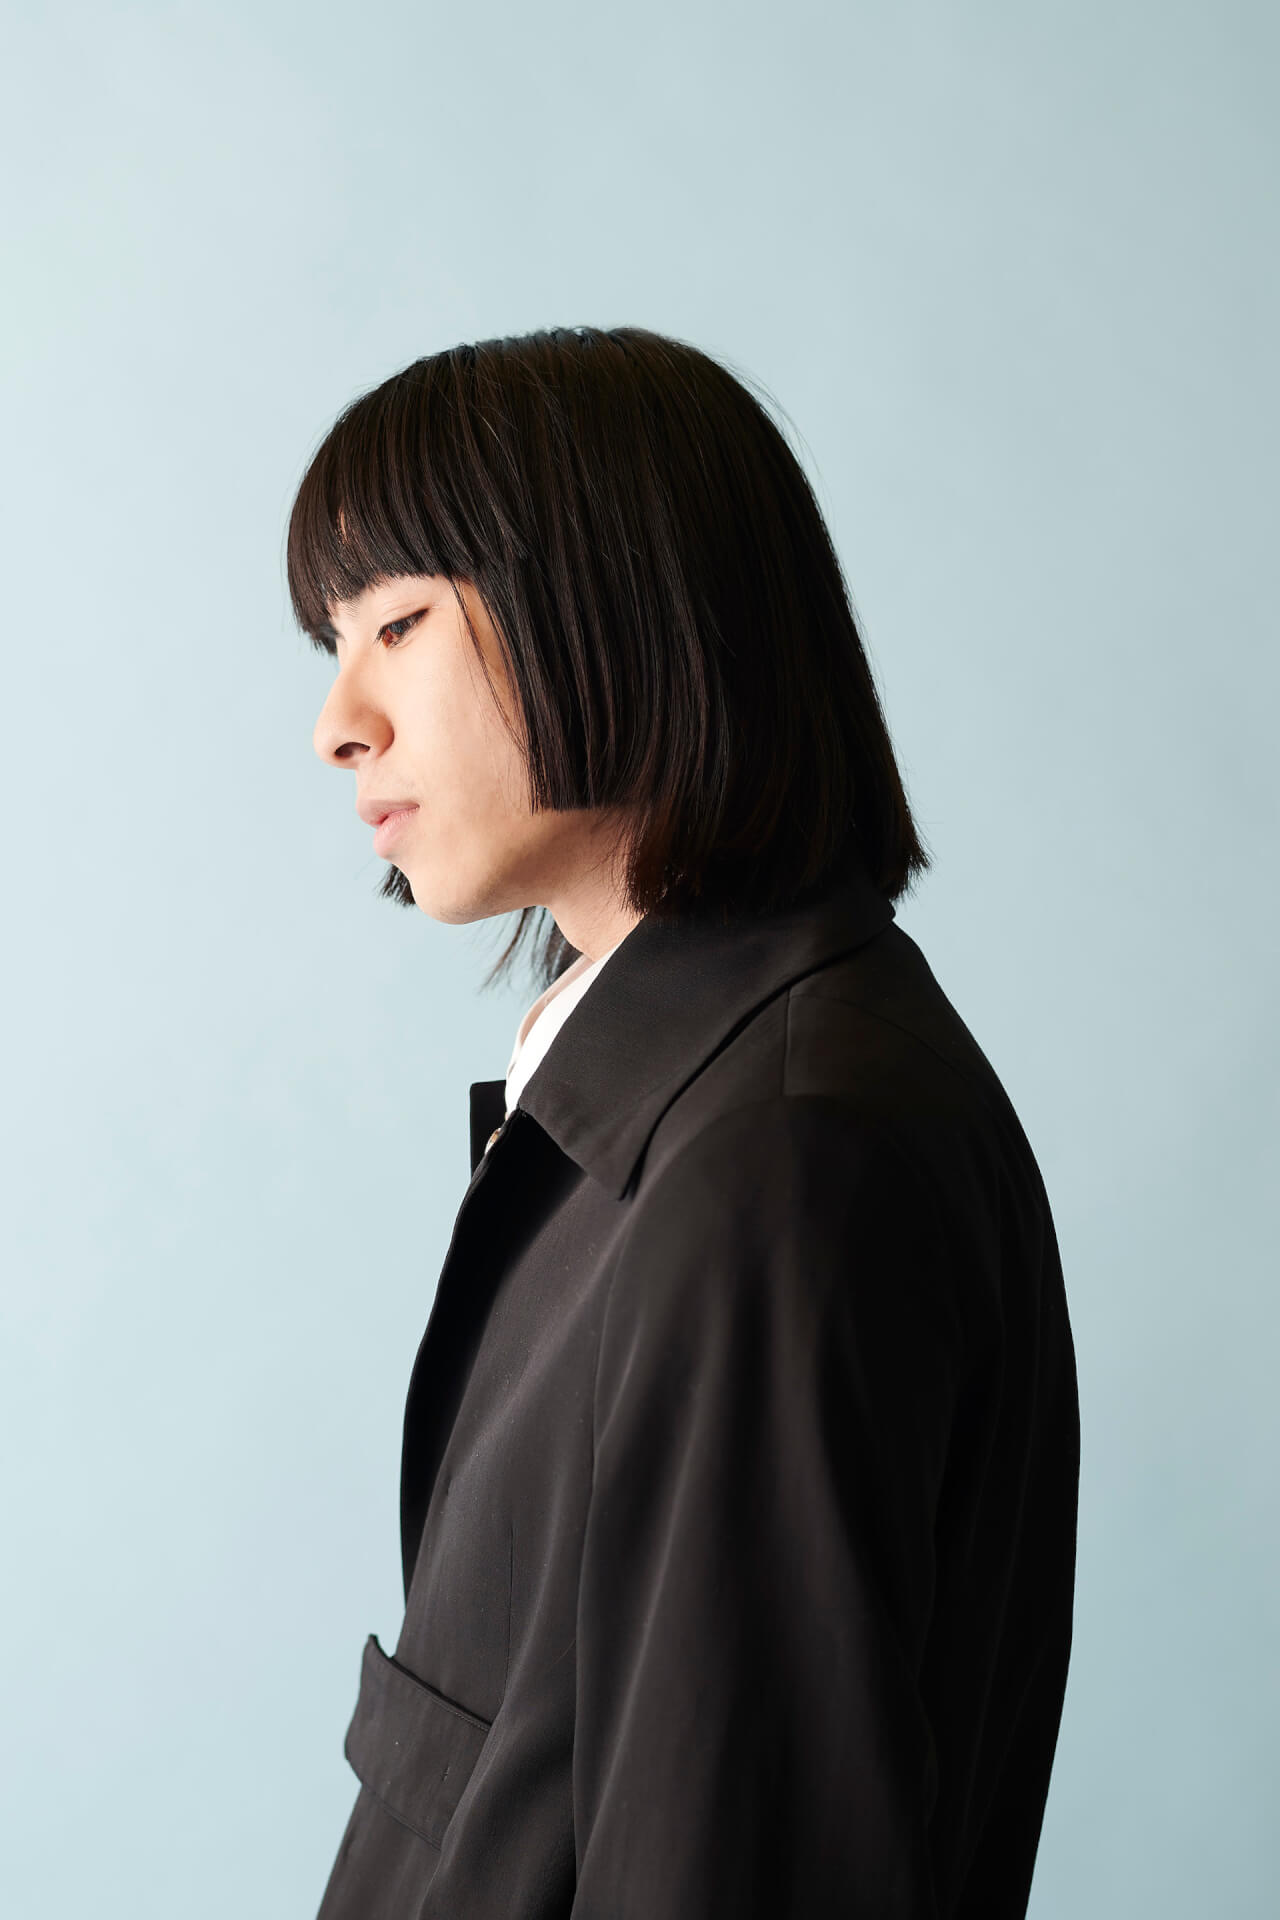 "JUBEEが客演にHIYADAMを迎えた新曲""Mess""のMVを公開!Yohji Igarashiがプロデュース music210914_jubee_hiyadam_1"